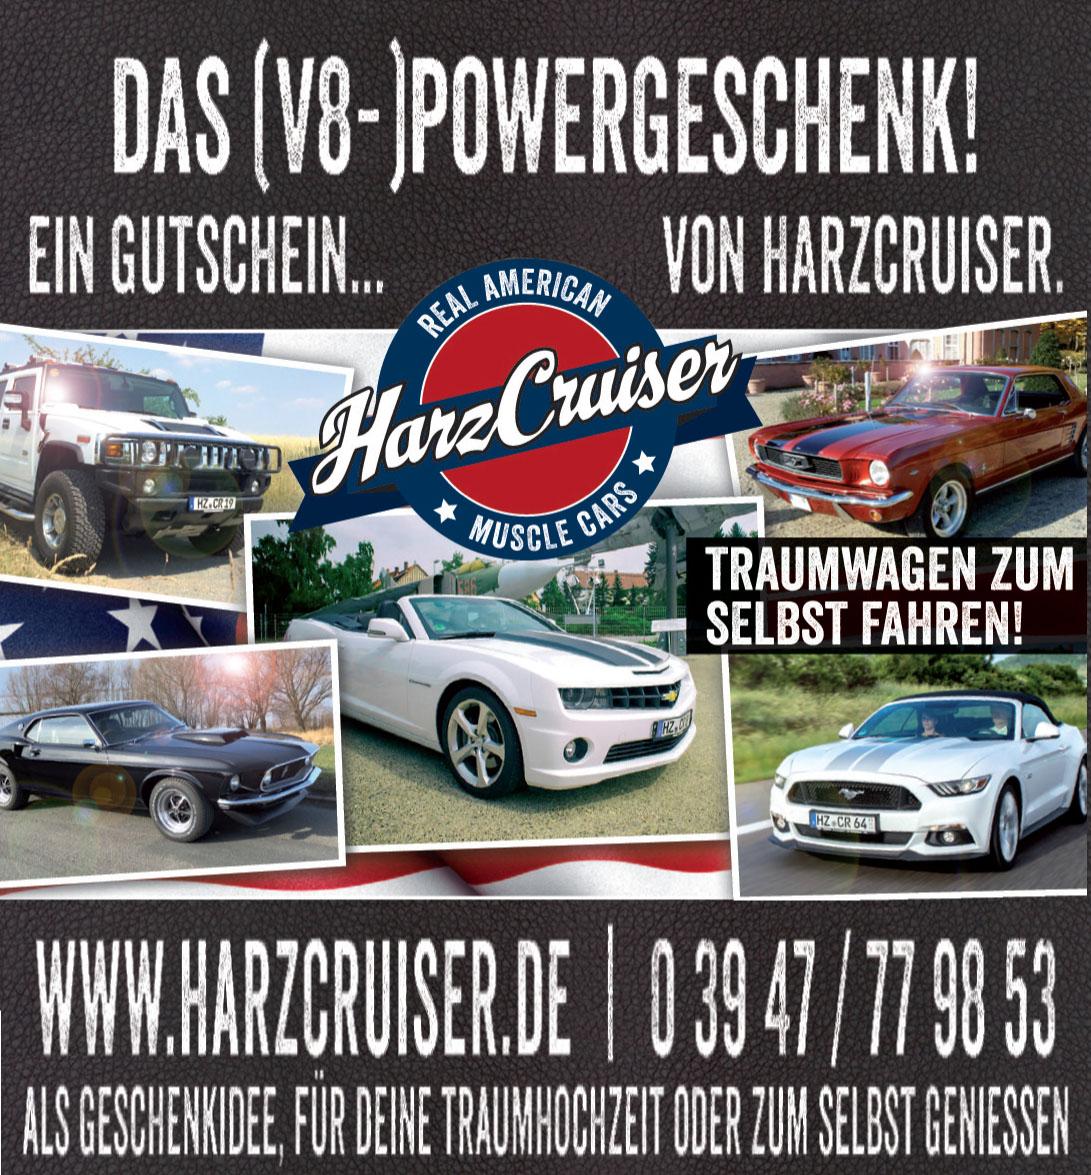 Harz Cruiser